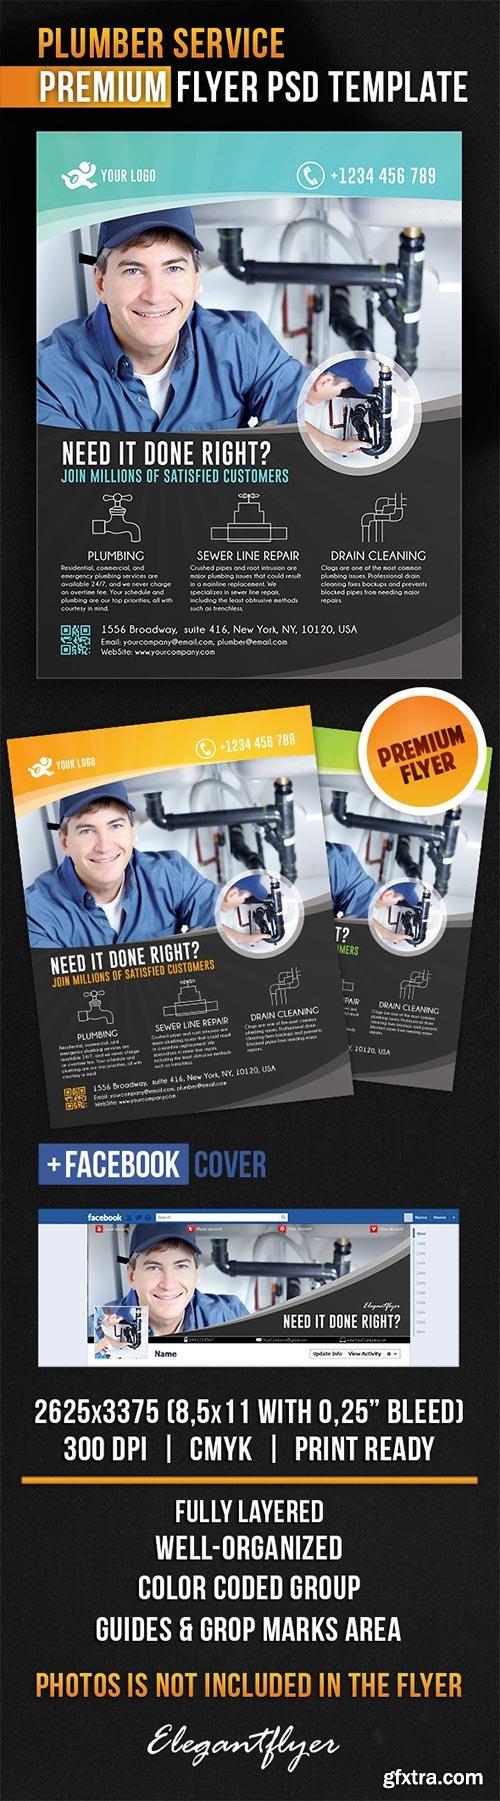 Plumber Service Flyer PSD Template + Facebook Cover